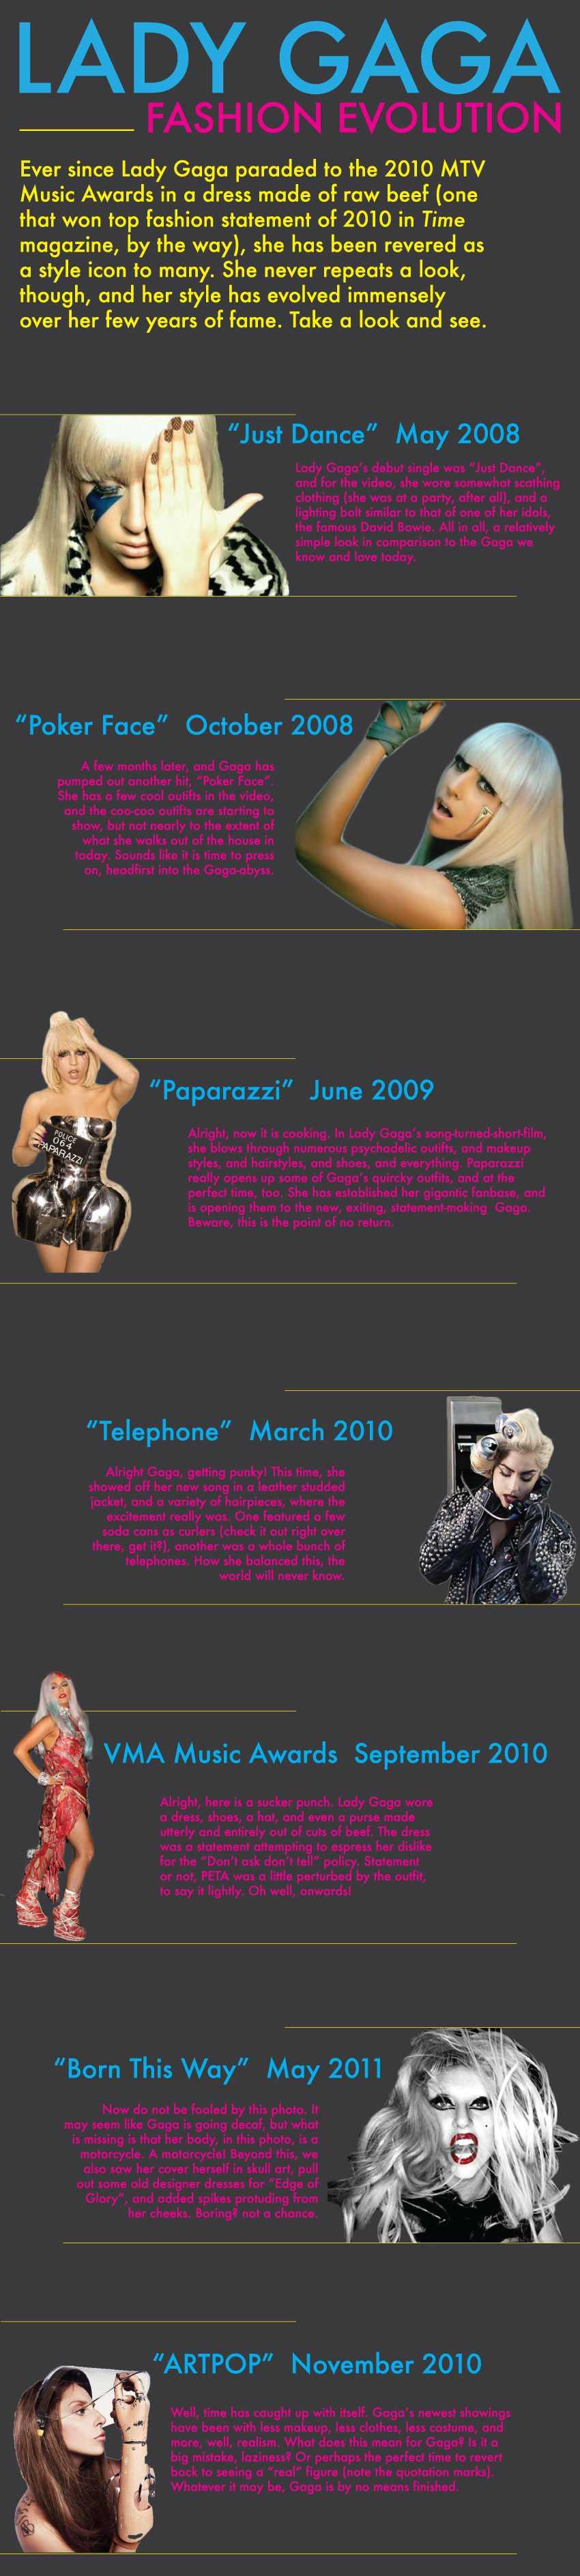 Lady-Gaga-Infographic_save2